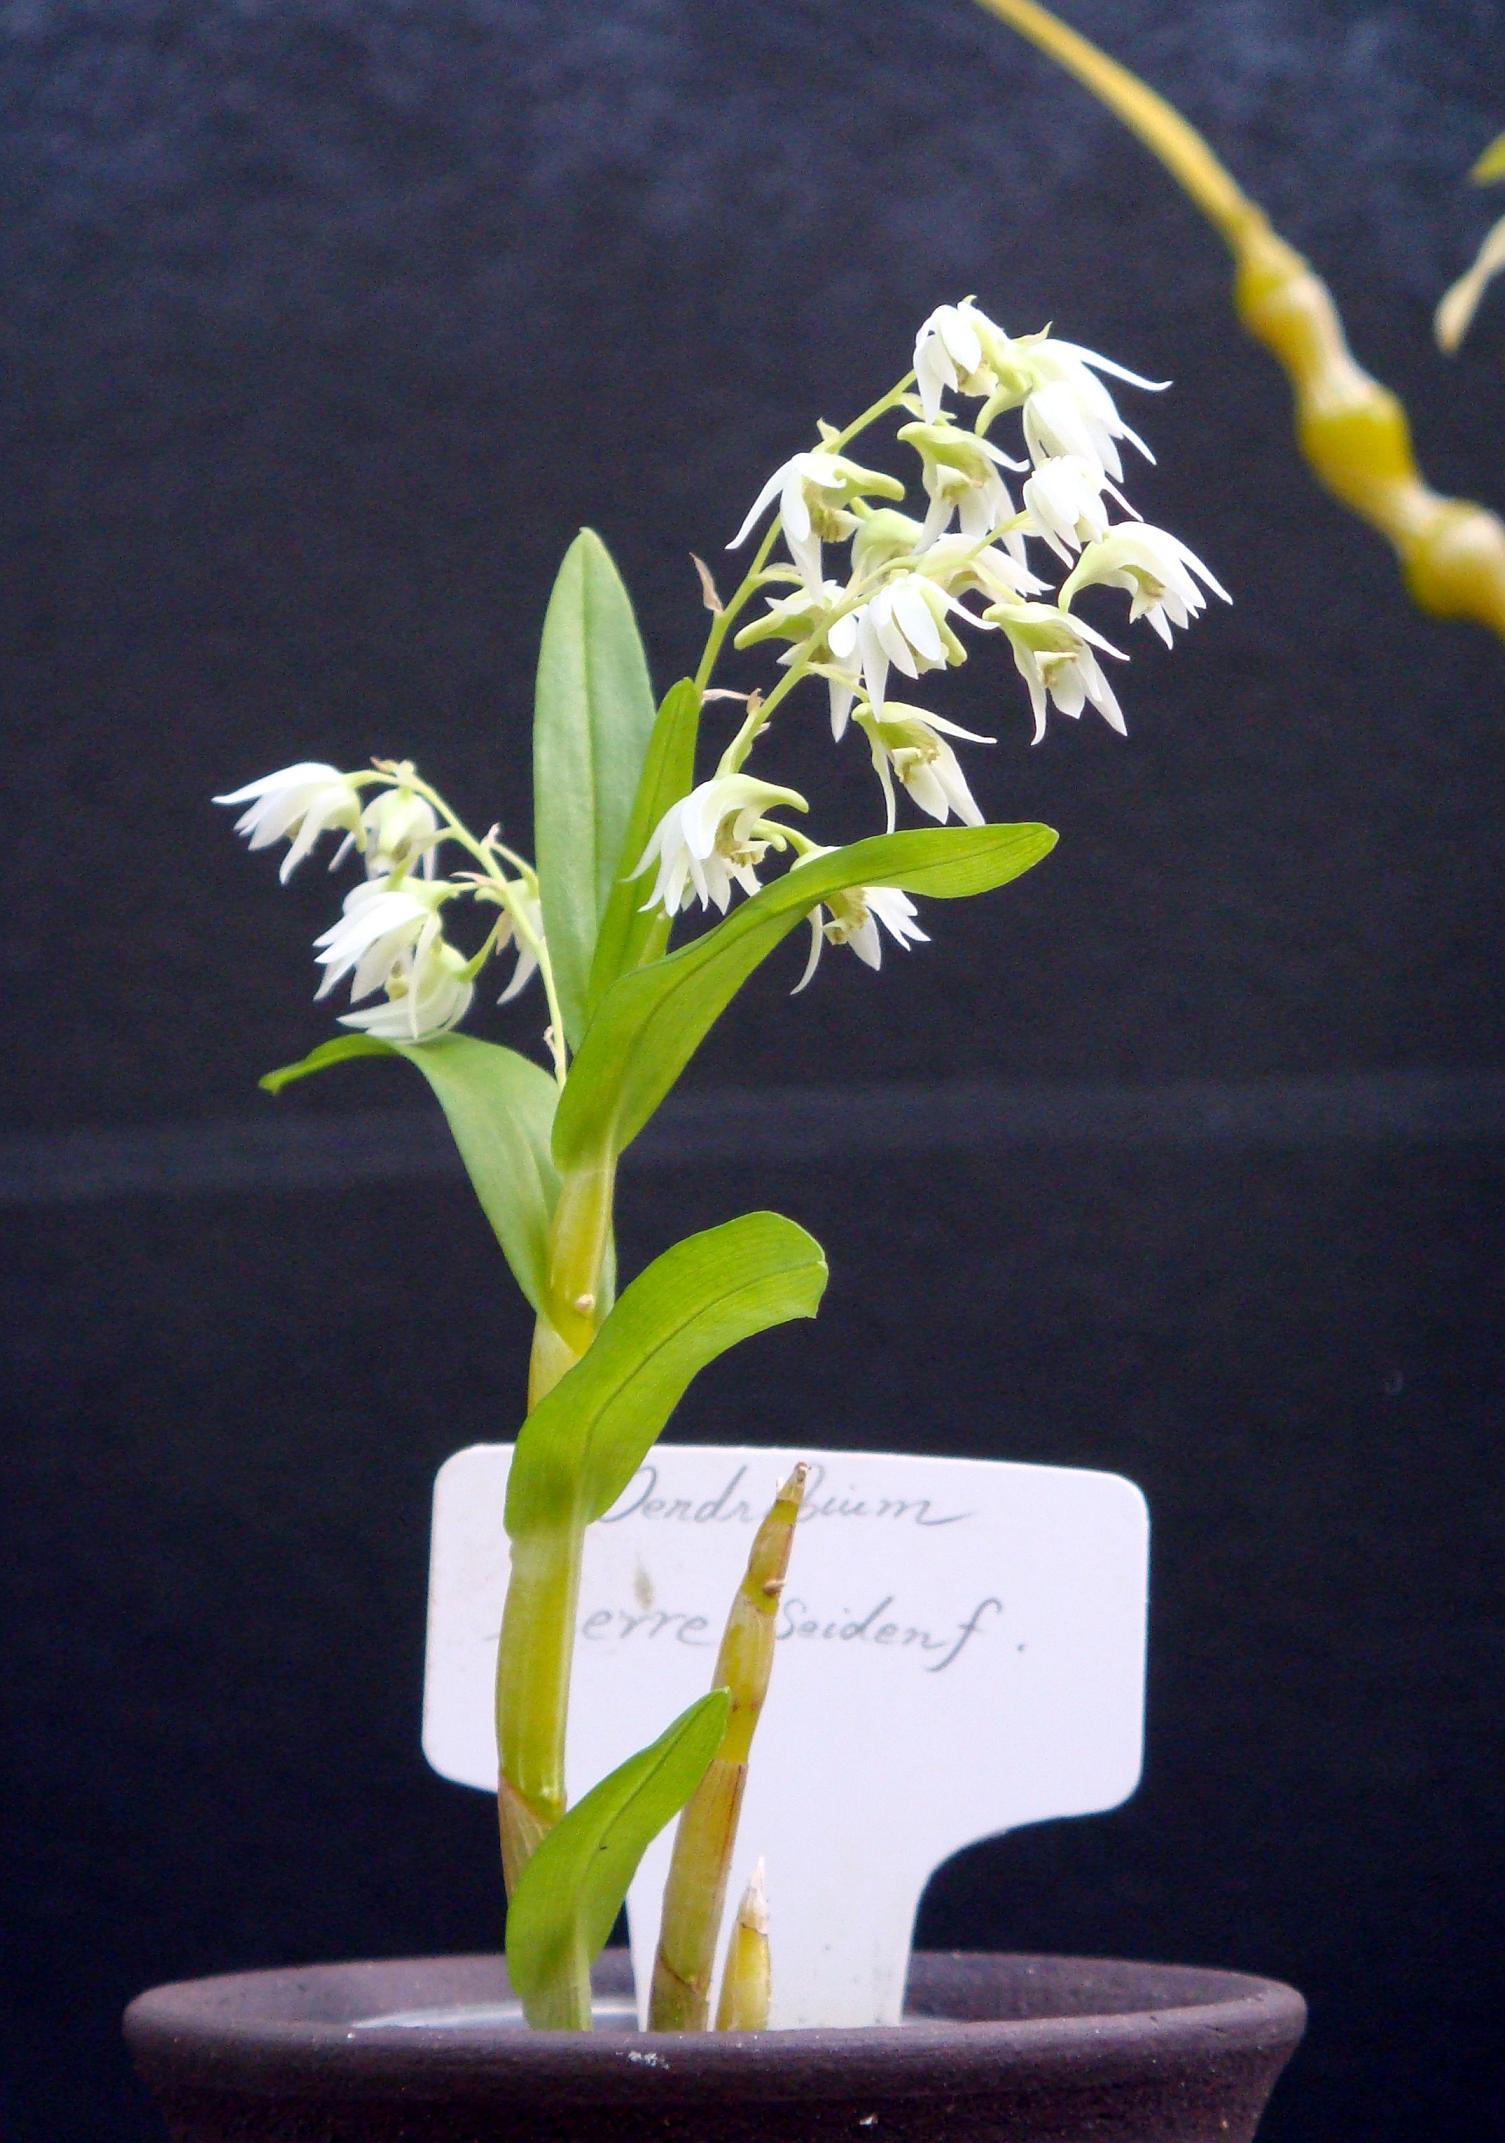 http://orchids.la.coocan.jp/Dendrobium/Dendrobium%20eserre/DSC02826.JPG